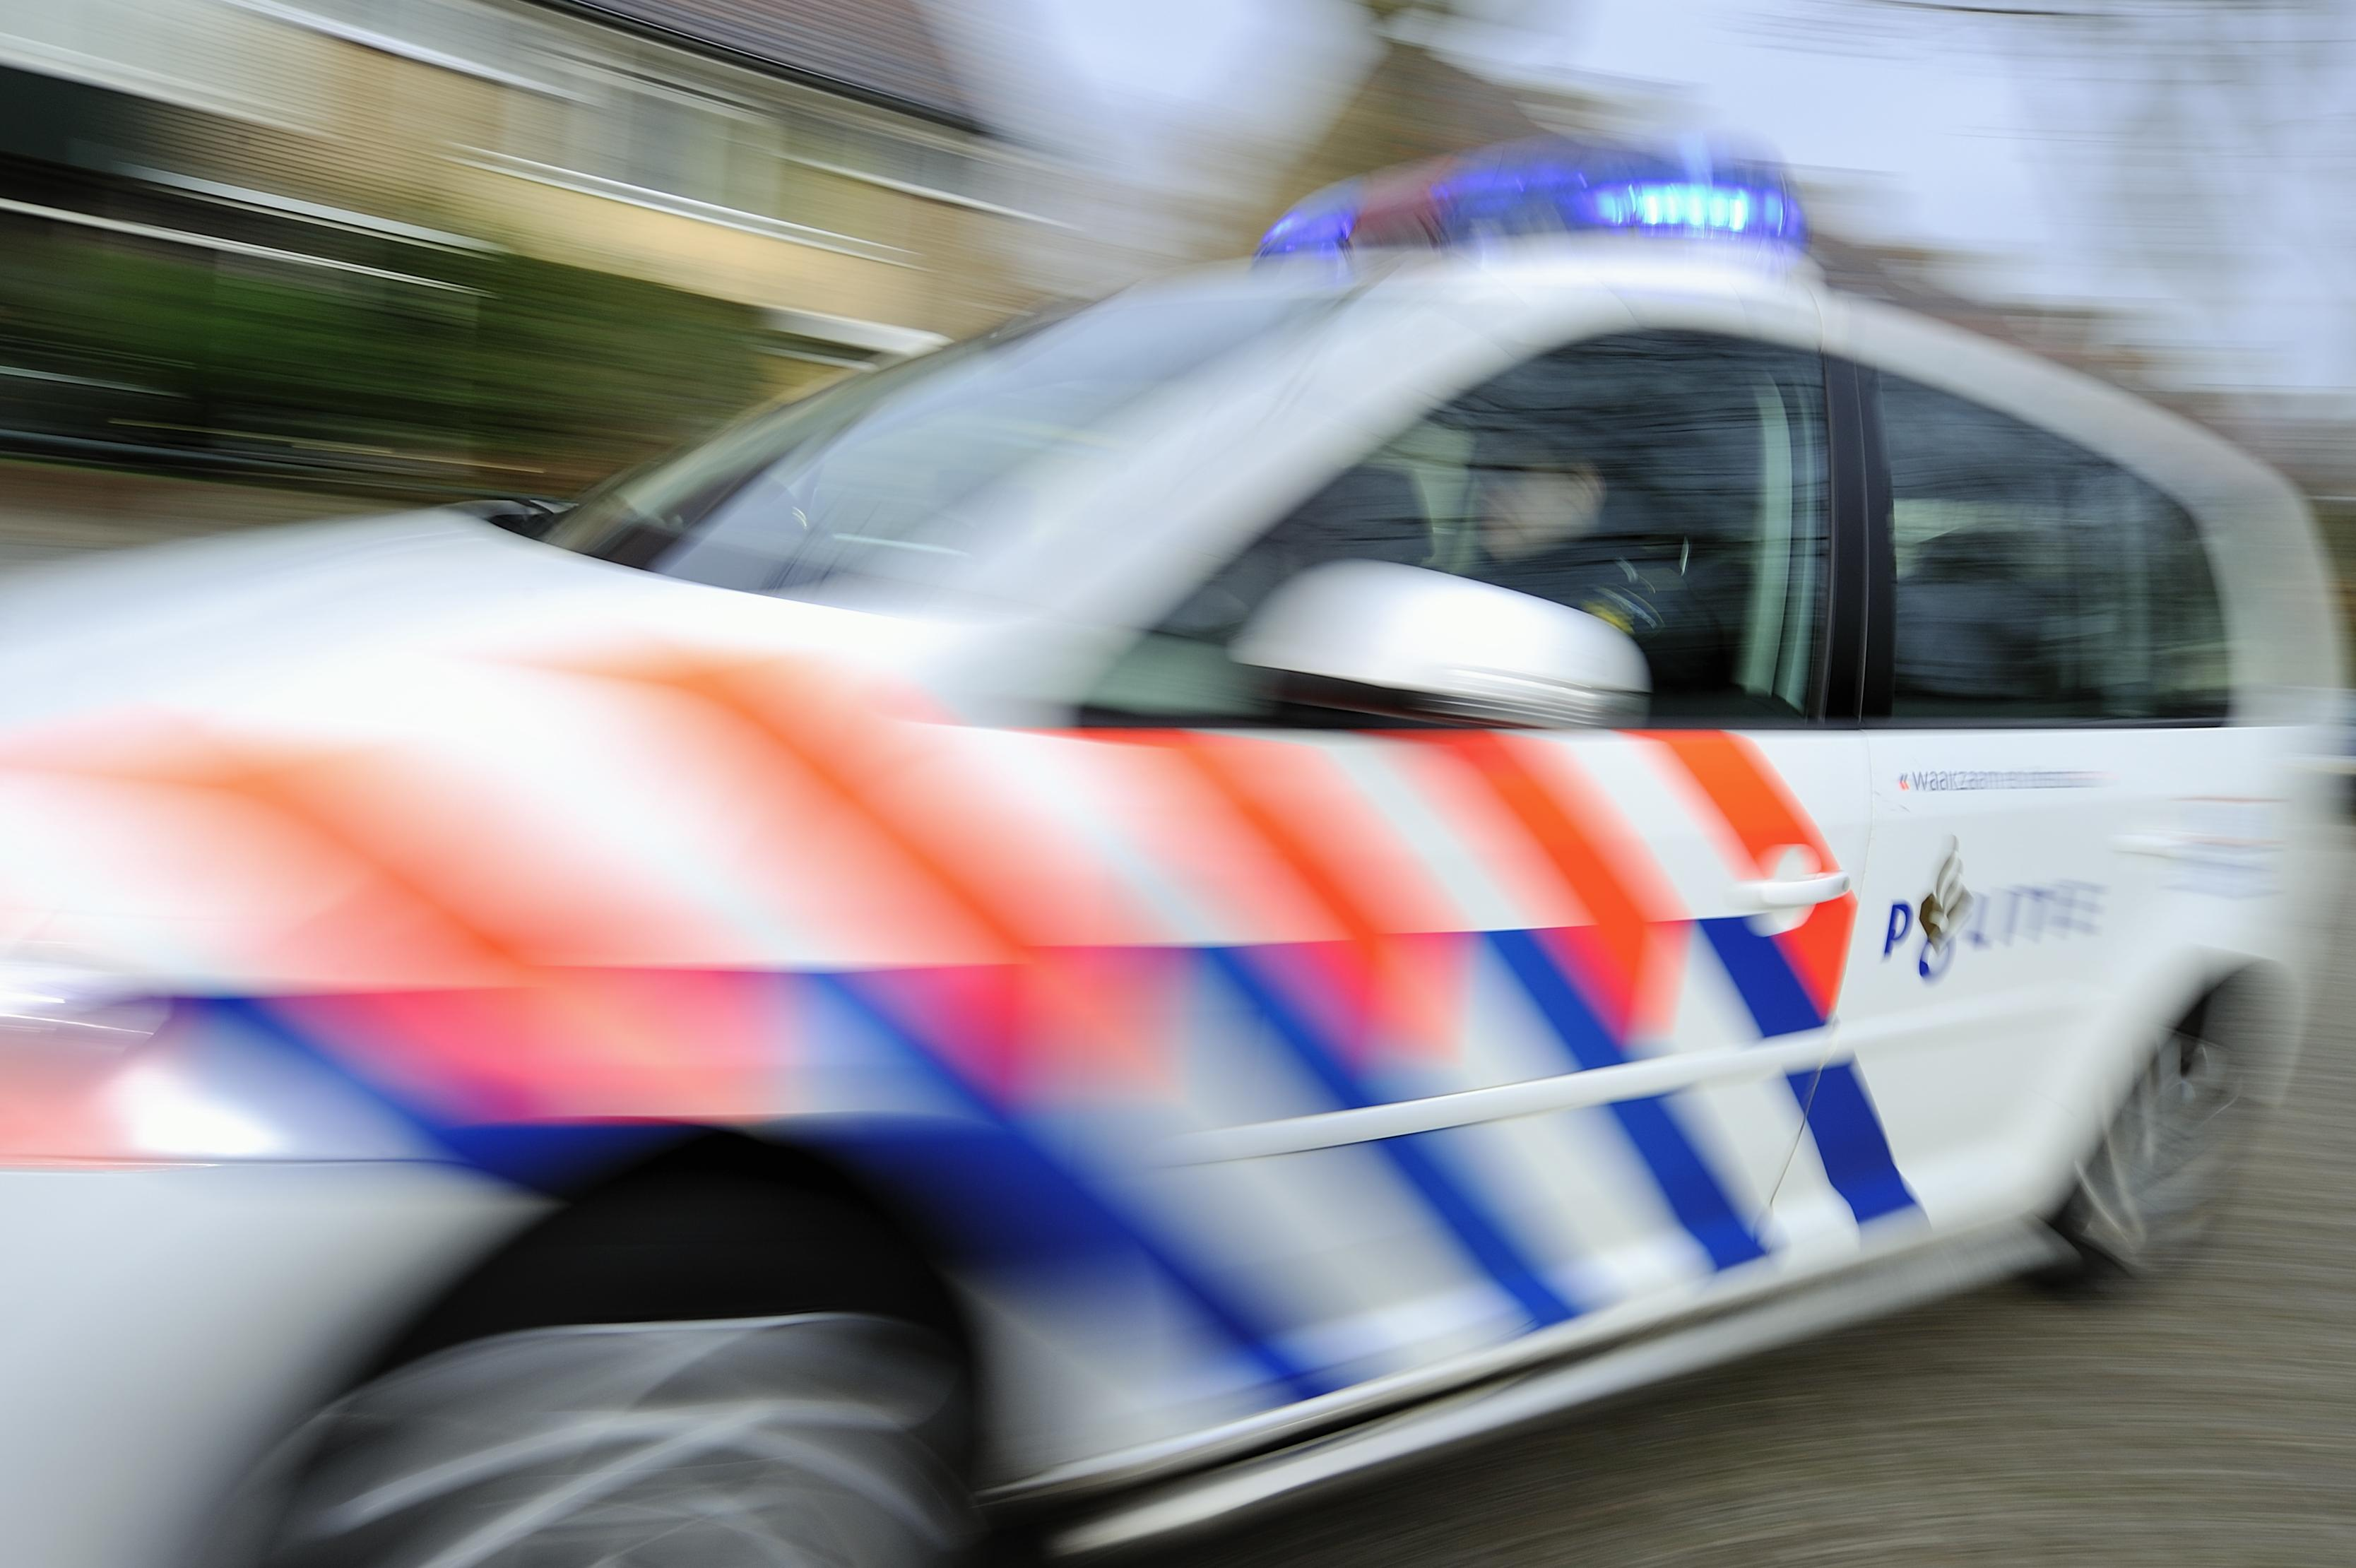 Valse melding over vuurwapen op Larenseweg in Hilversum